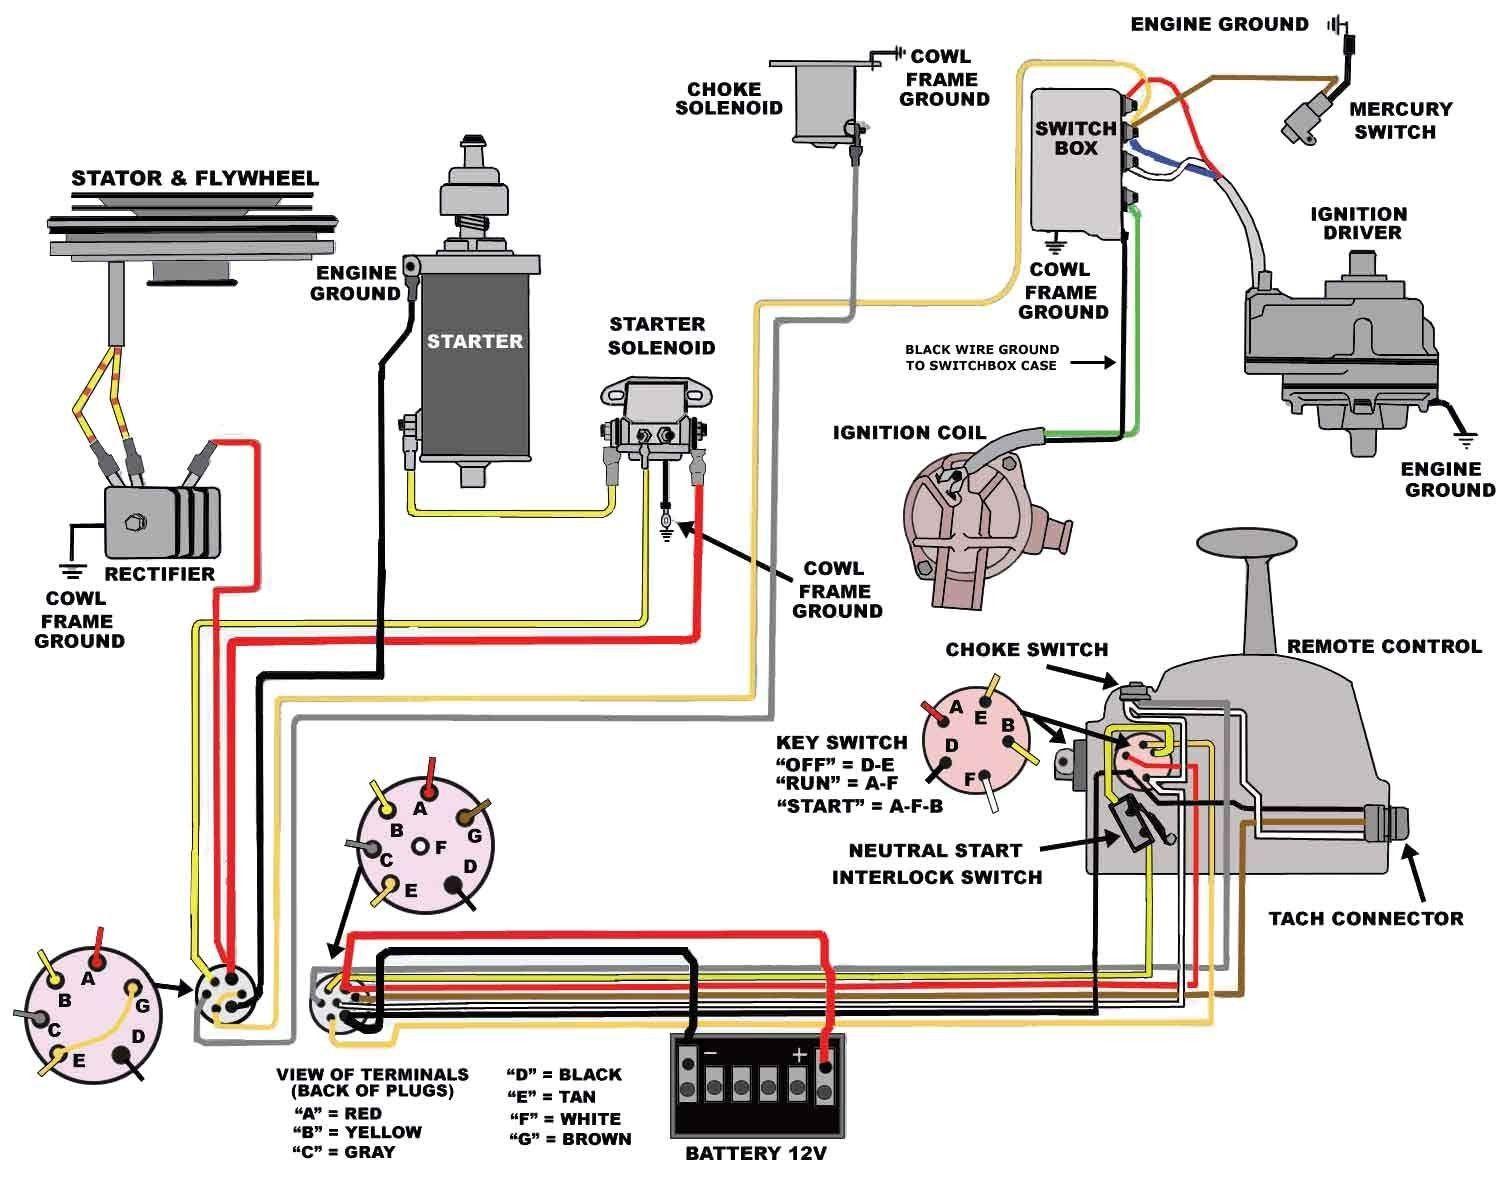 Inspirational Mercury Control Box Wiring Diagram In 2020 Boat Wiring Mercury Outboard Electrical Diagram